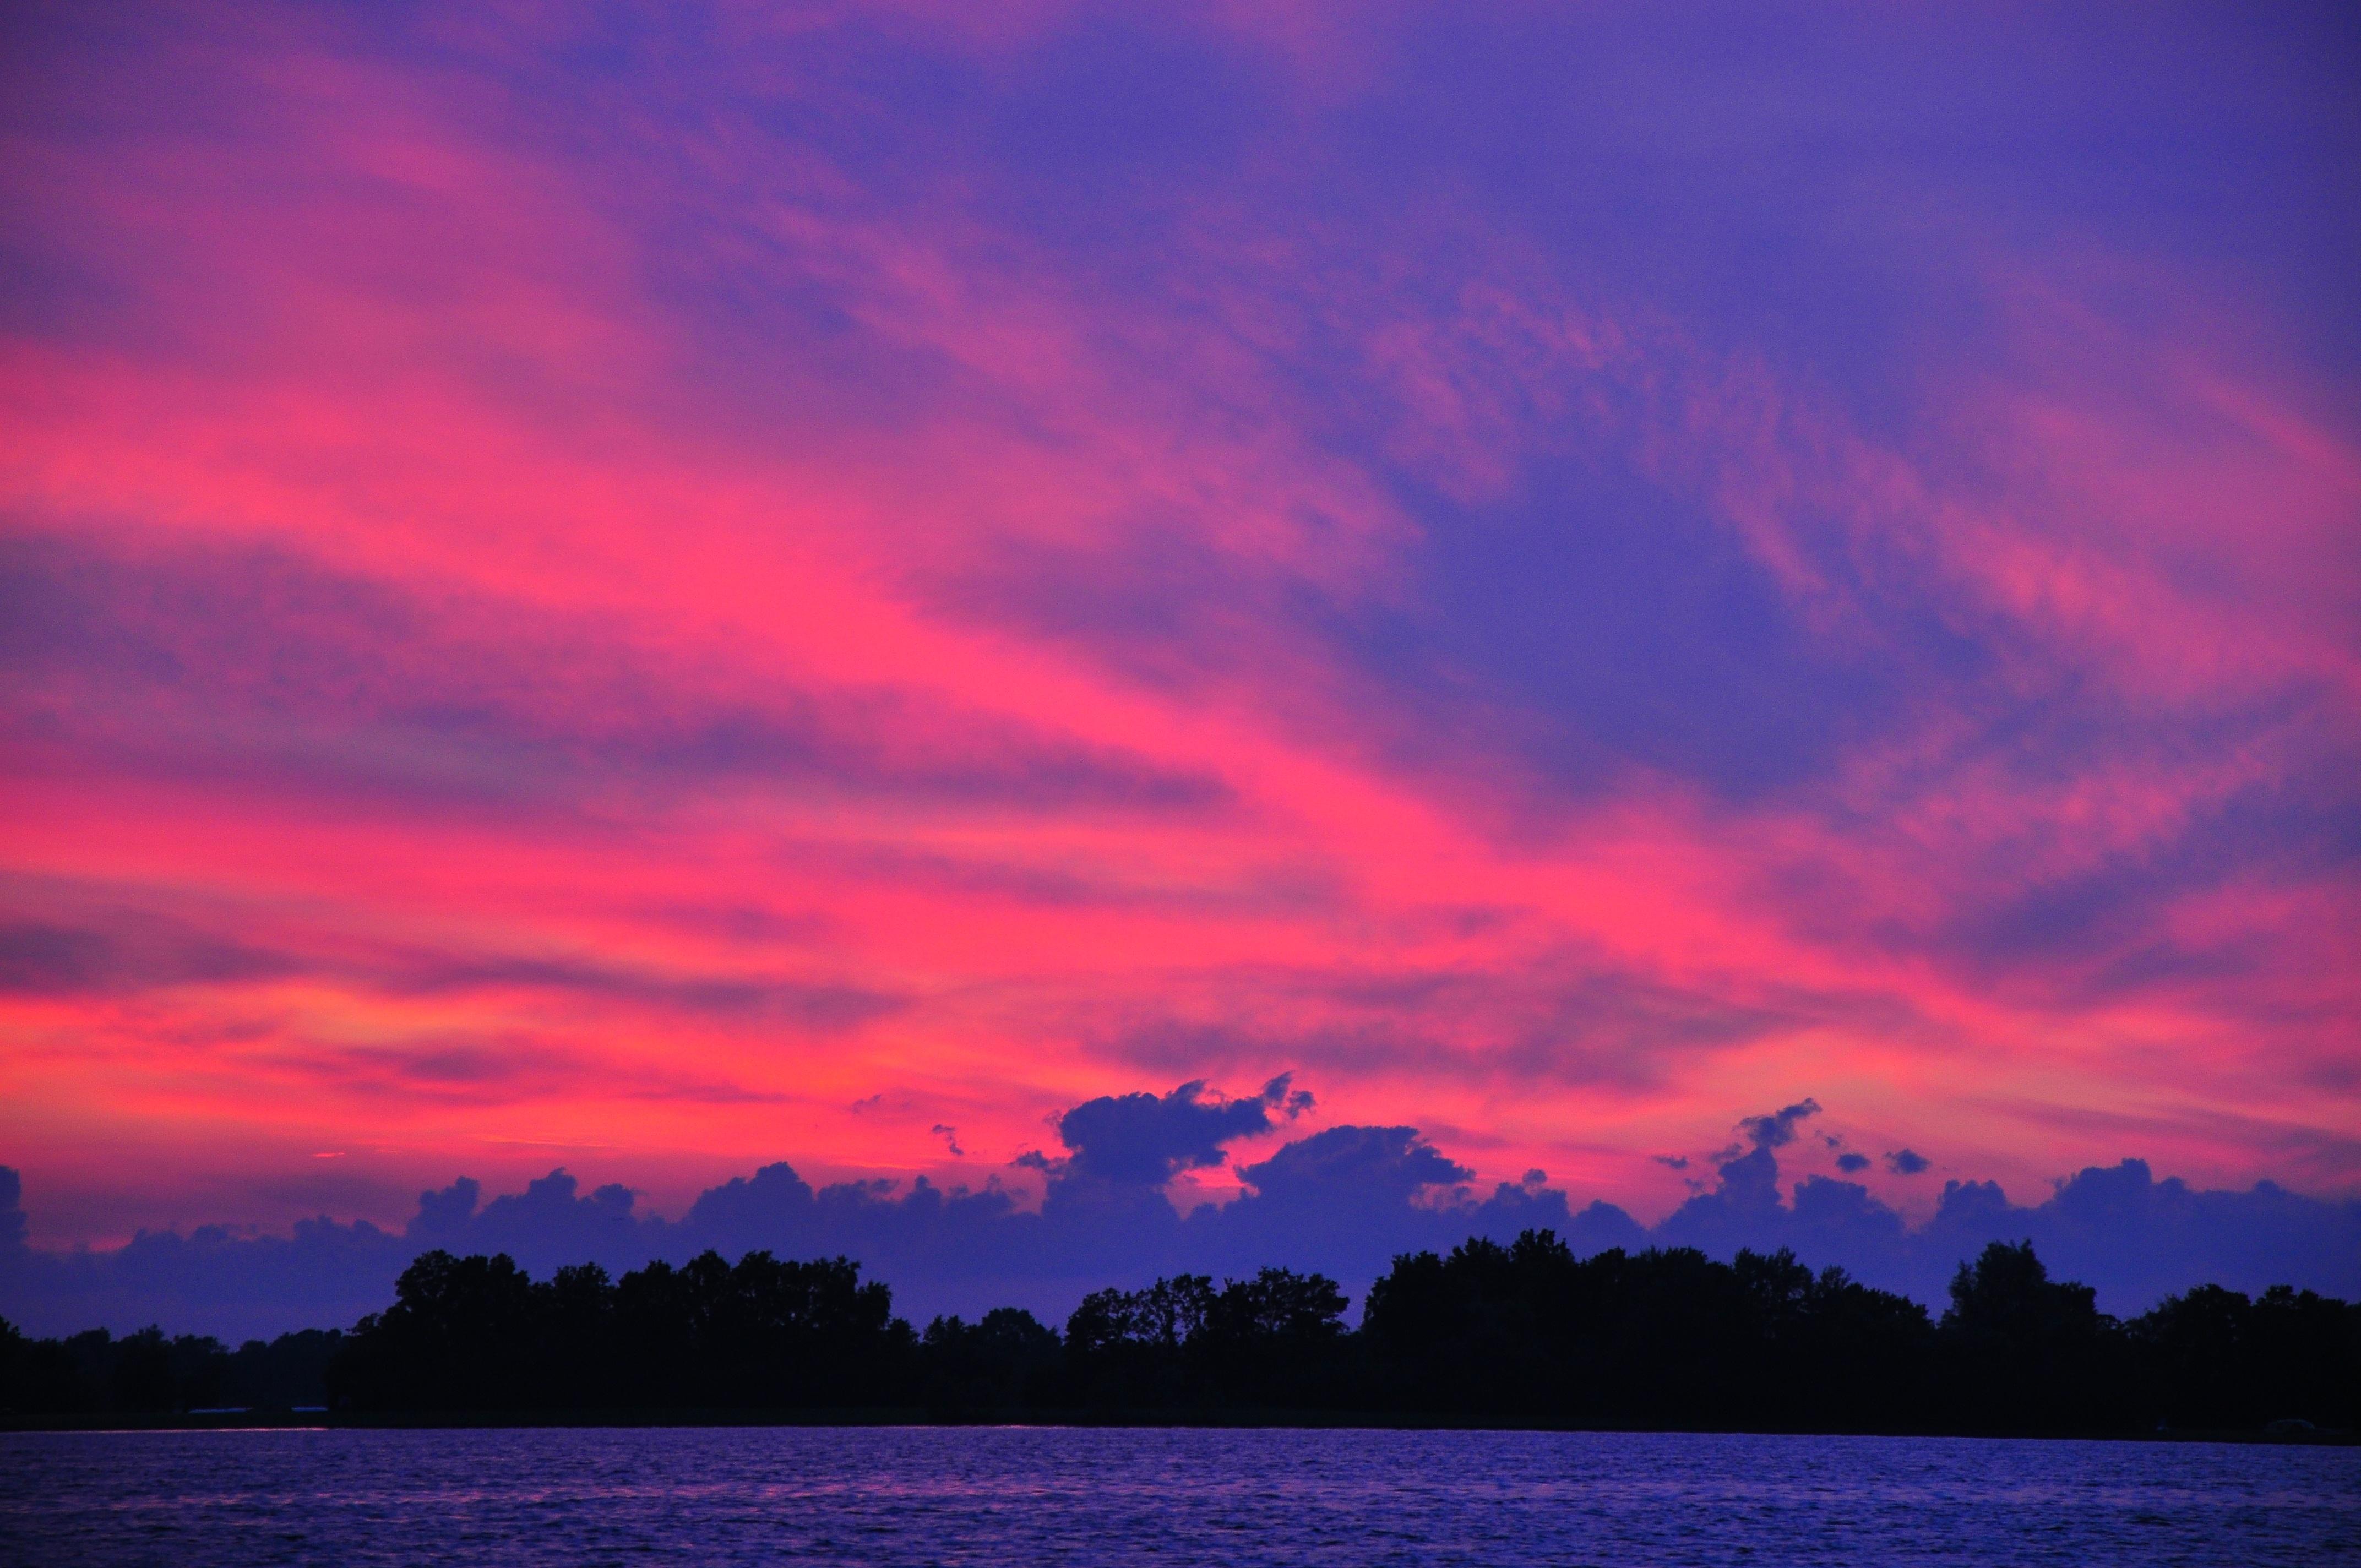 картинки лиловое небо легко запоминающиеся